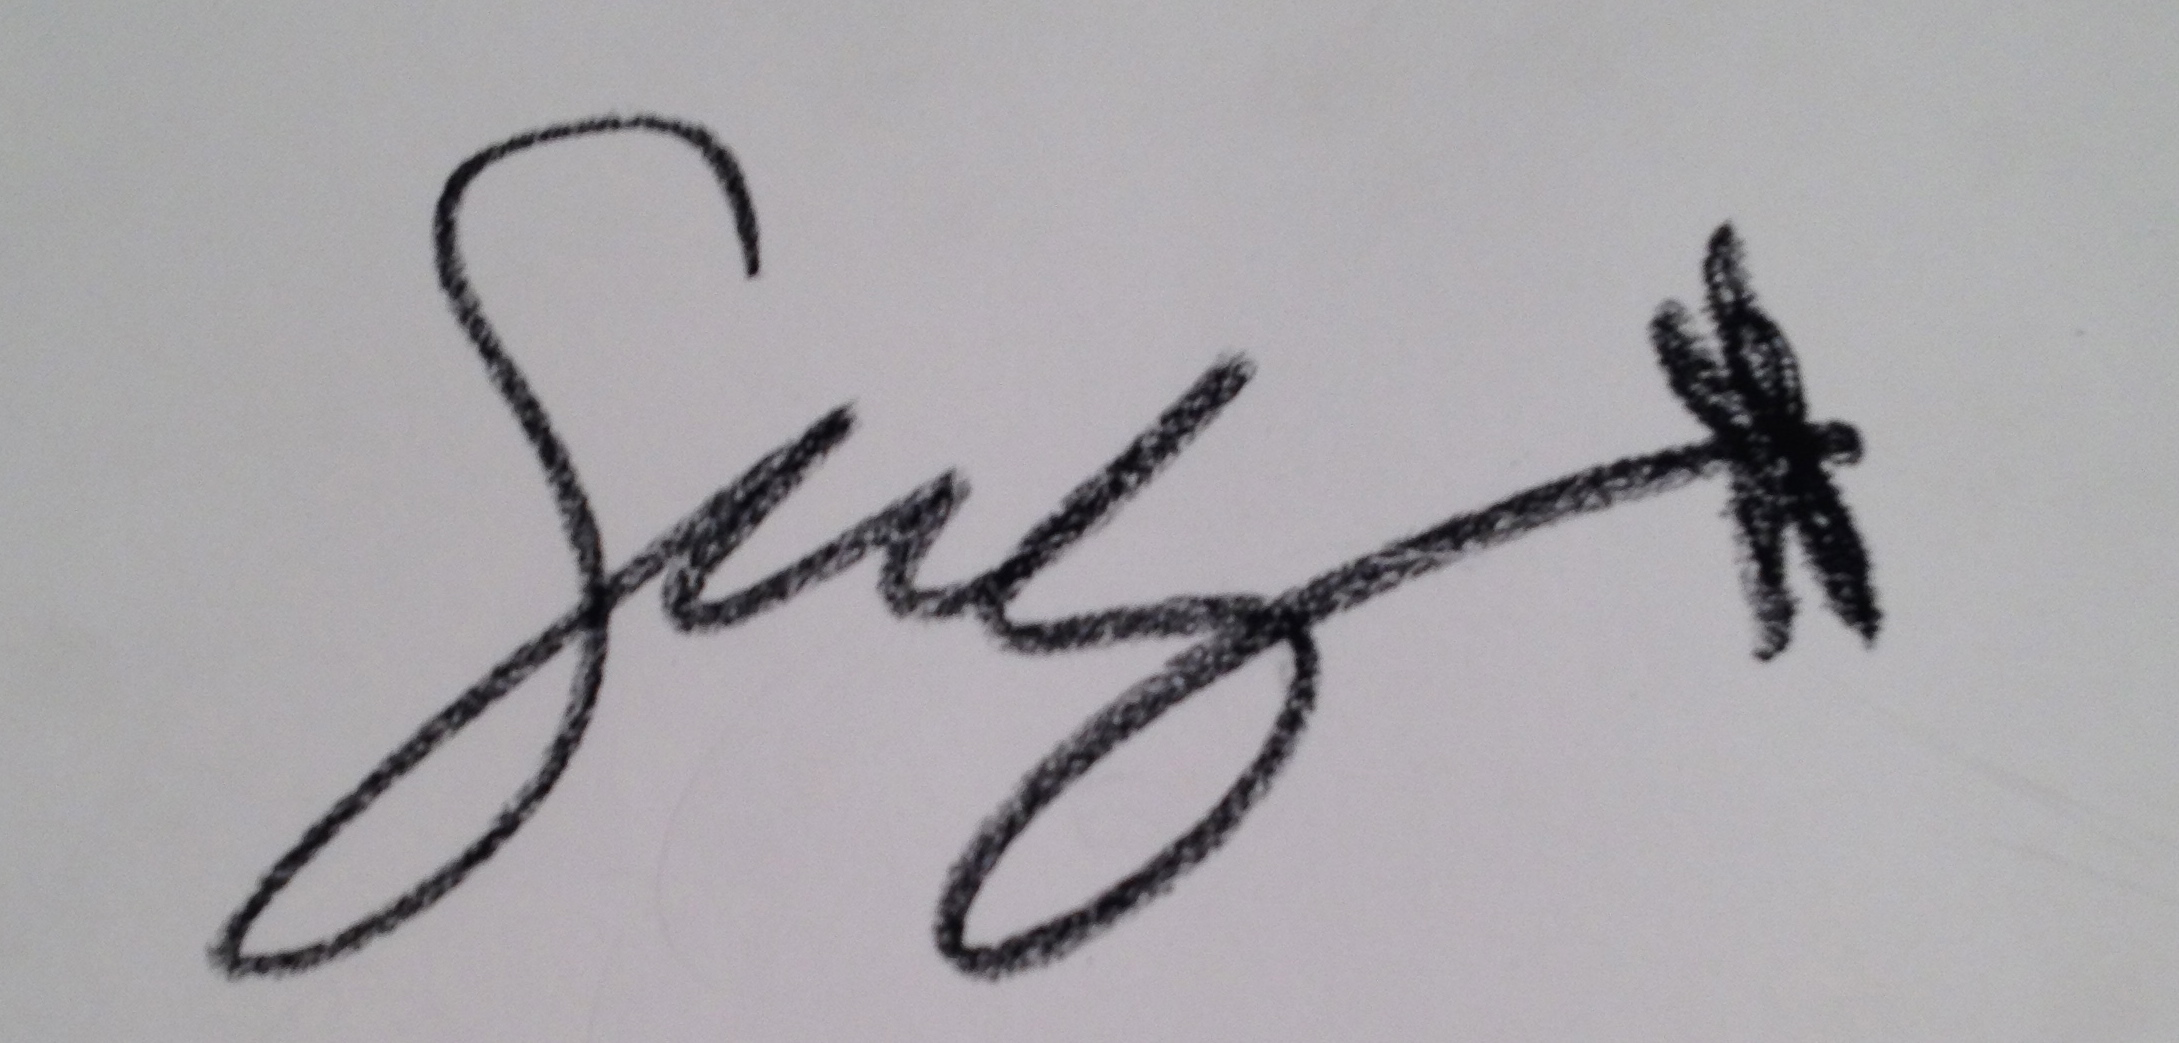 swhaleysart's Signature